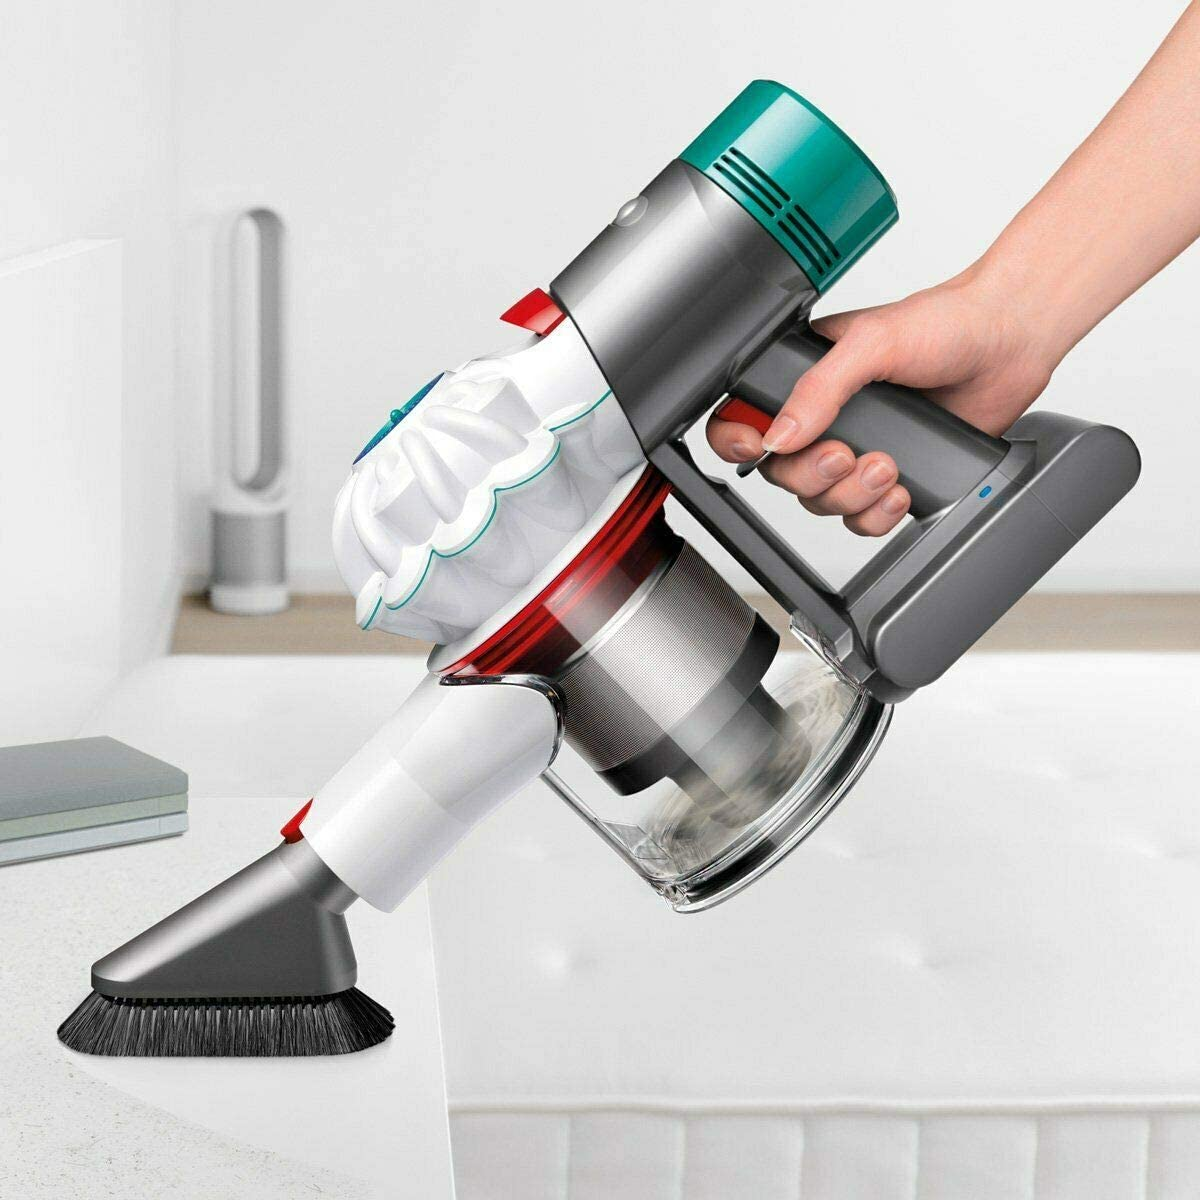 Dyson V7 Mattress Handheld Vacuum | Teal/Teal | New